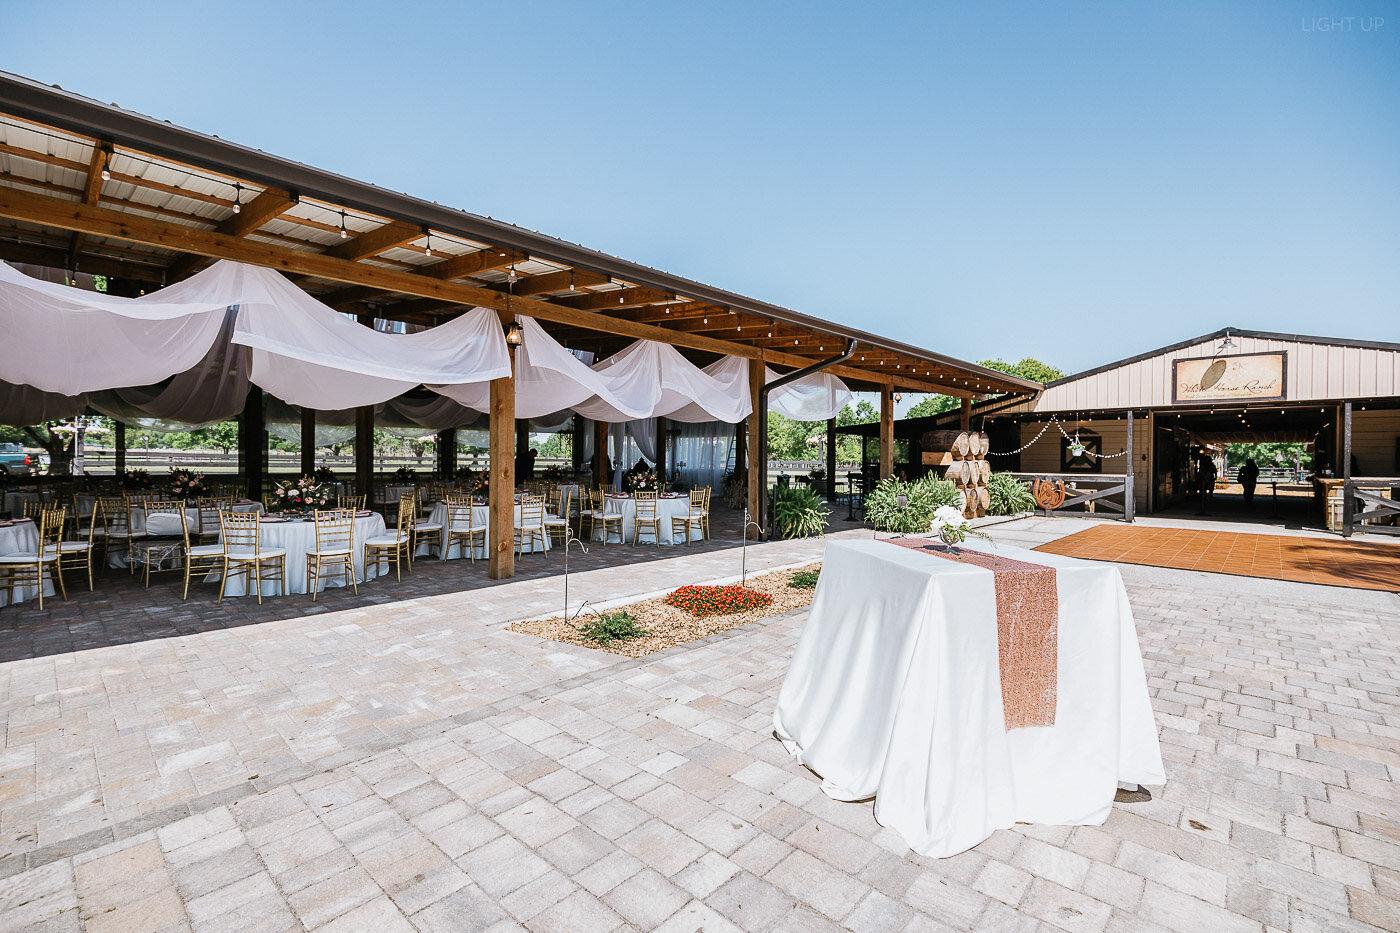 Lakeland-barn-wedding-at-white-horse-ranch-4.jpg